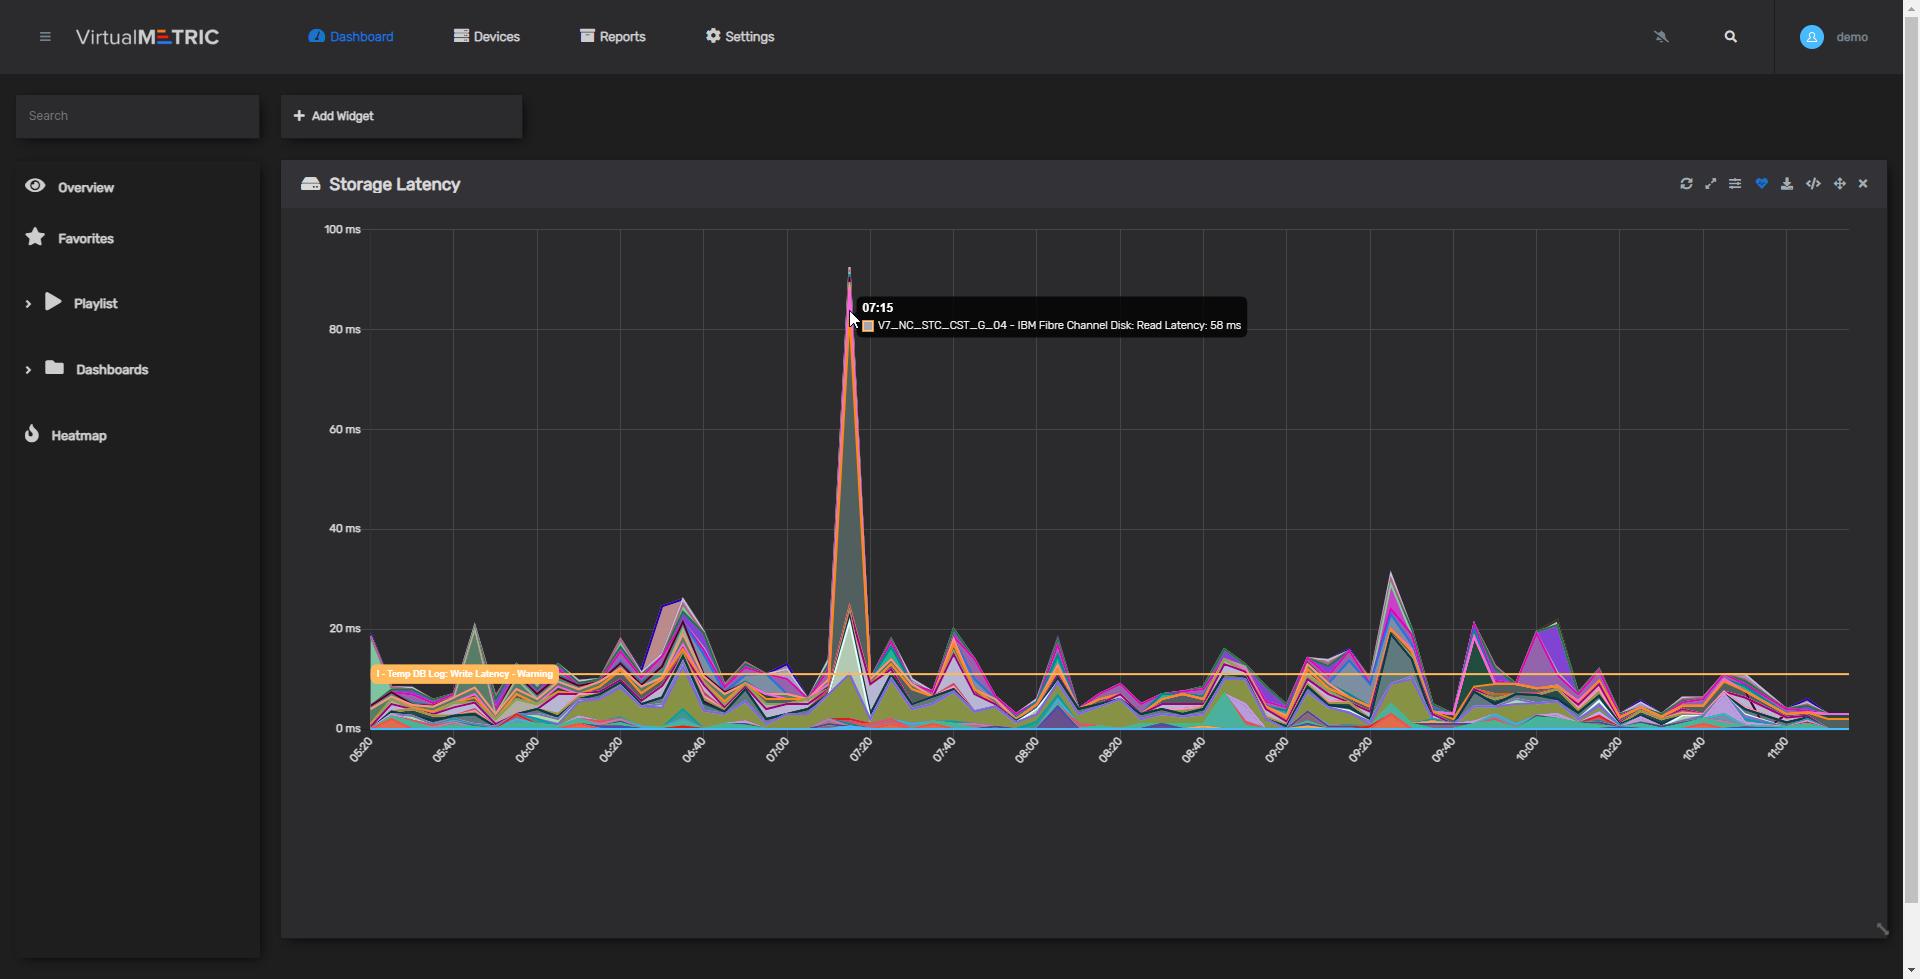 Storage Latency Monitoring